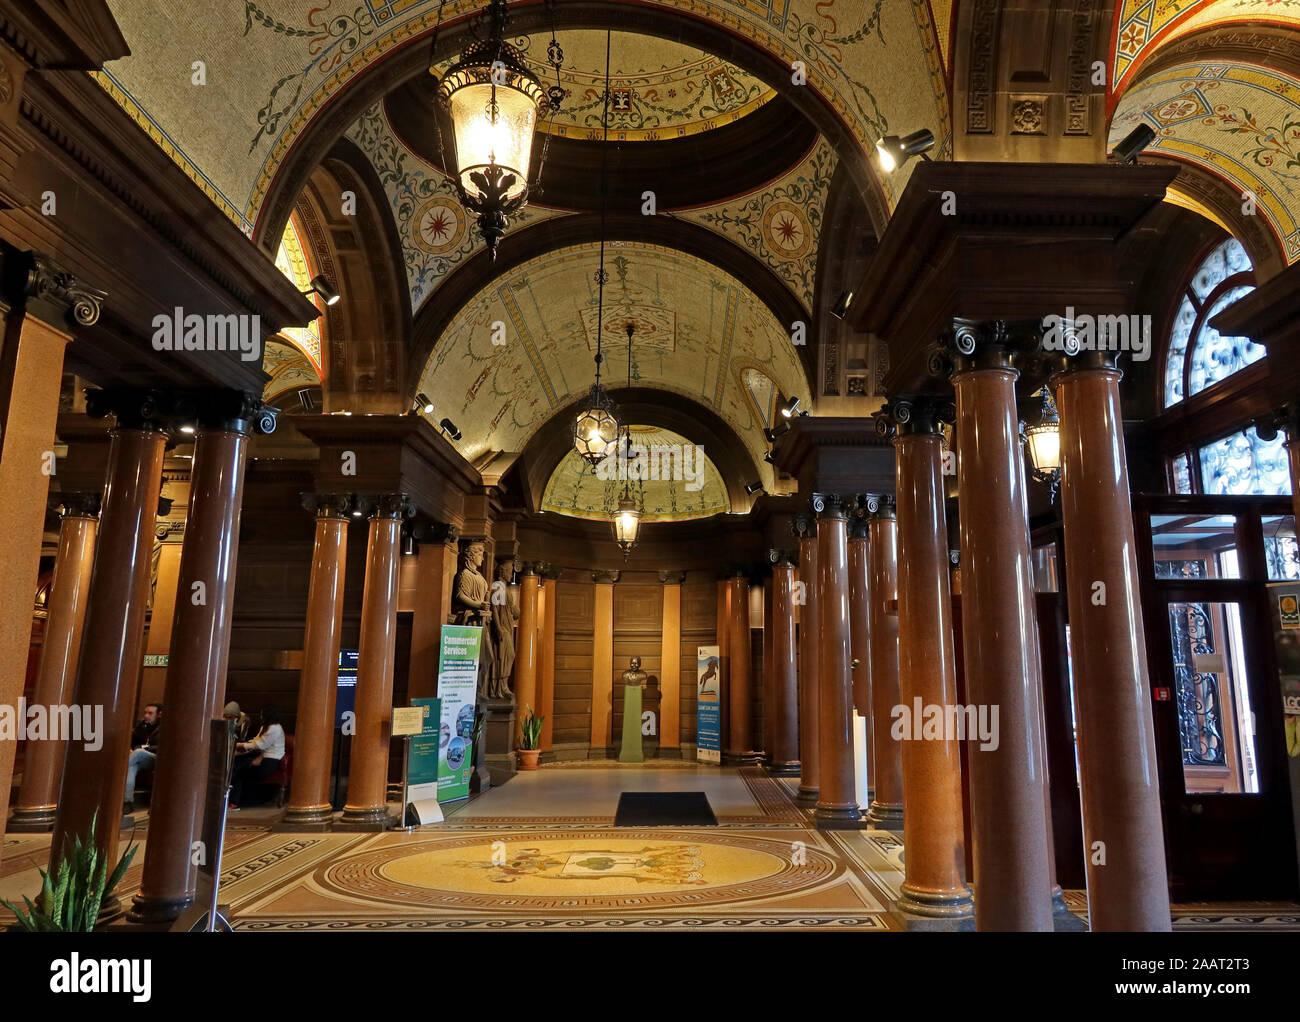 HotpixUk,@HotpixUK,GoTonySmith,UK,England,English,Glasgow,Scotland,G2 1AL,city centre,columns,marble,building,architecture,dome,domes,curve,curves,flavour of Italy,alabaster,Victorian architecture